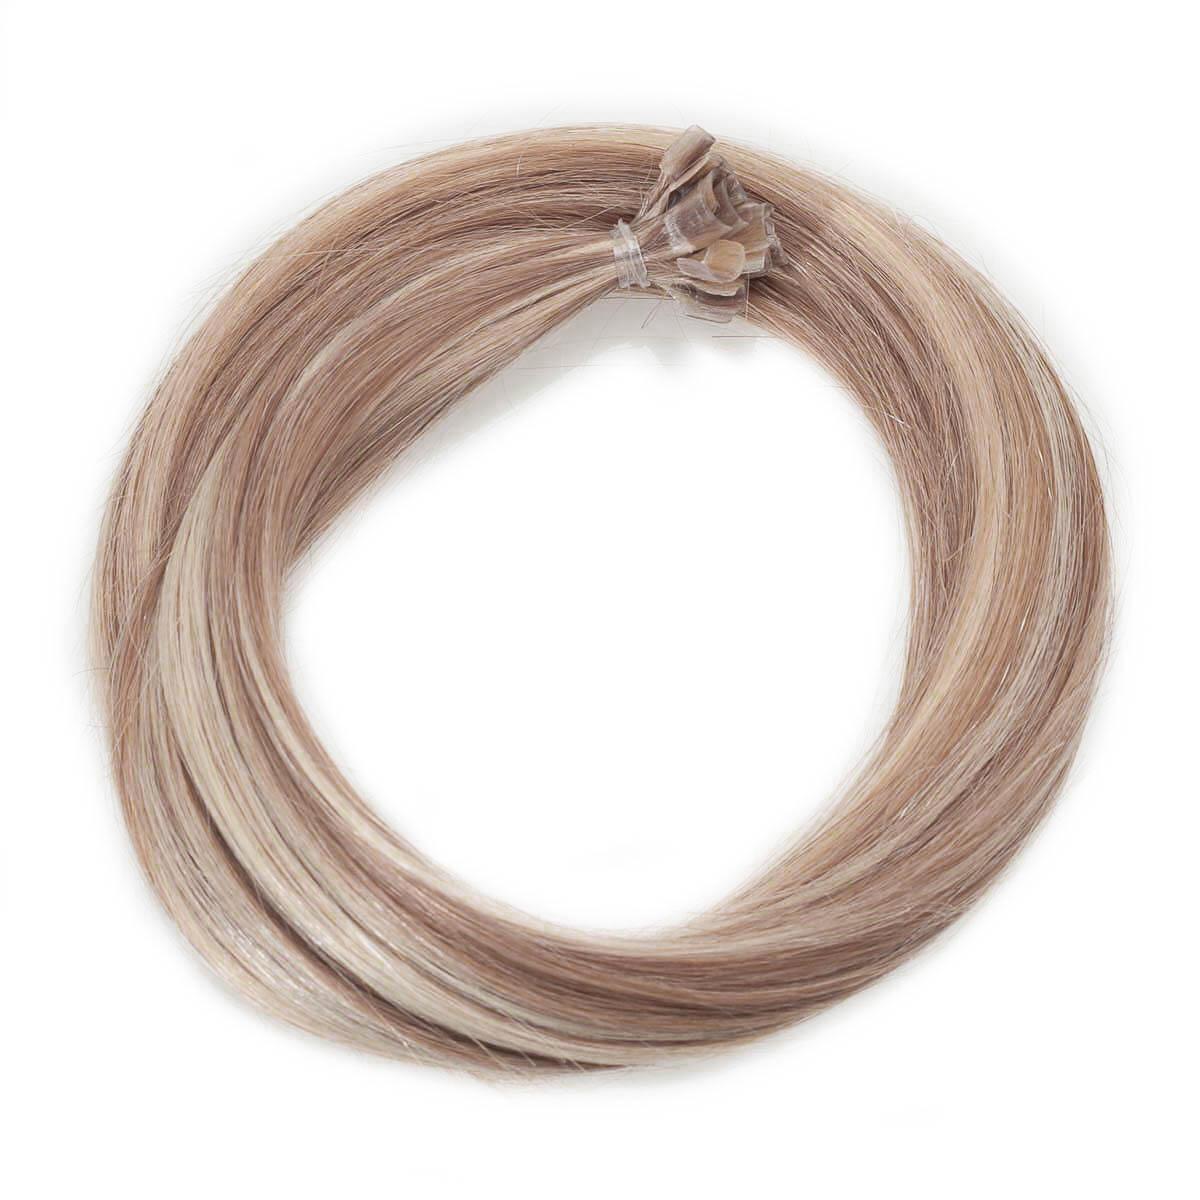 Nail Hair Original M7.3/10.8 Cendre Ash Blonde Mix 60 cm